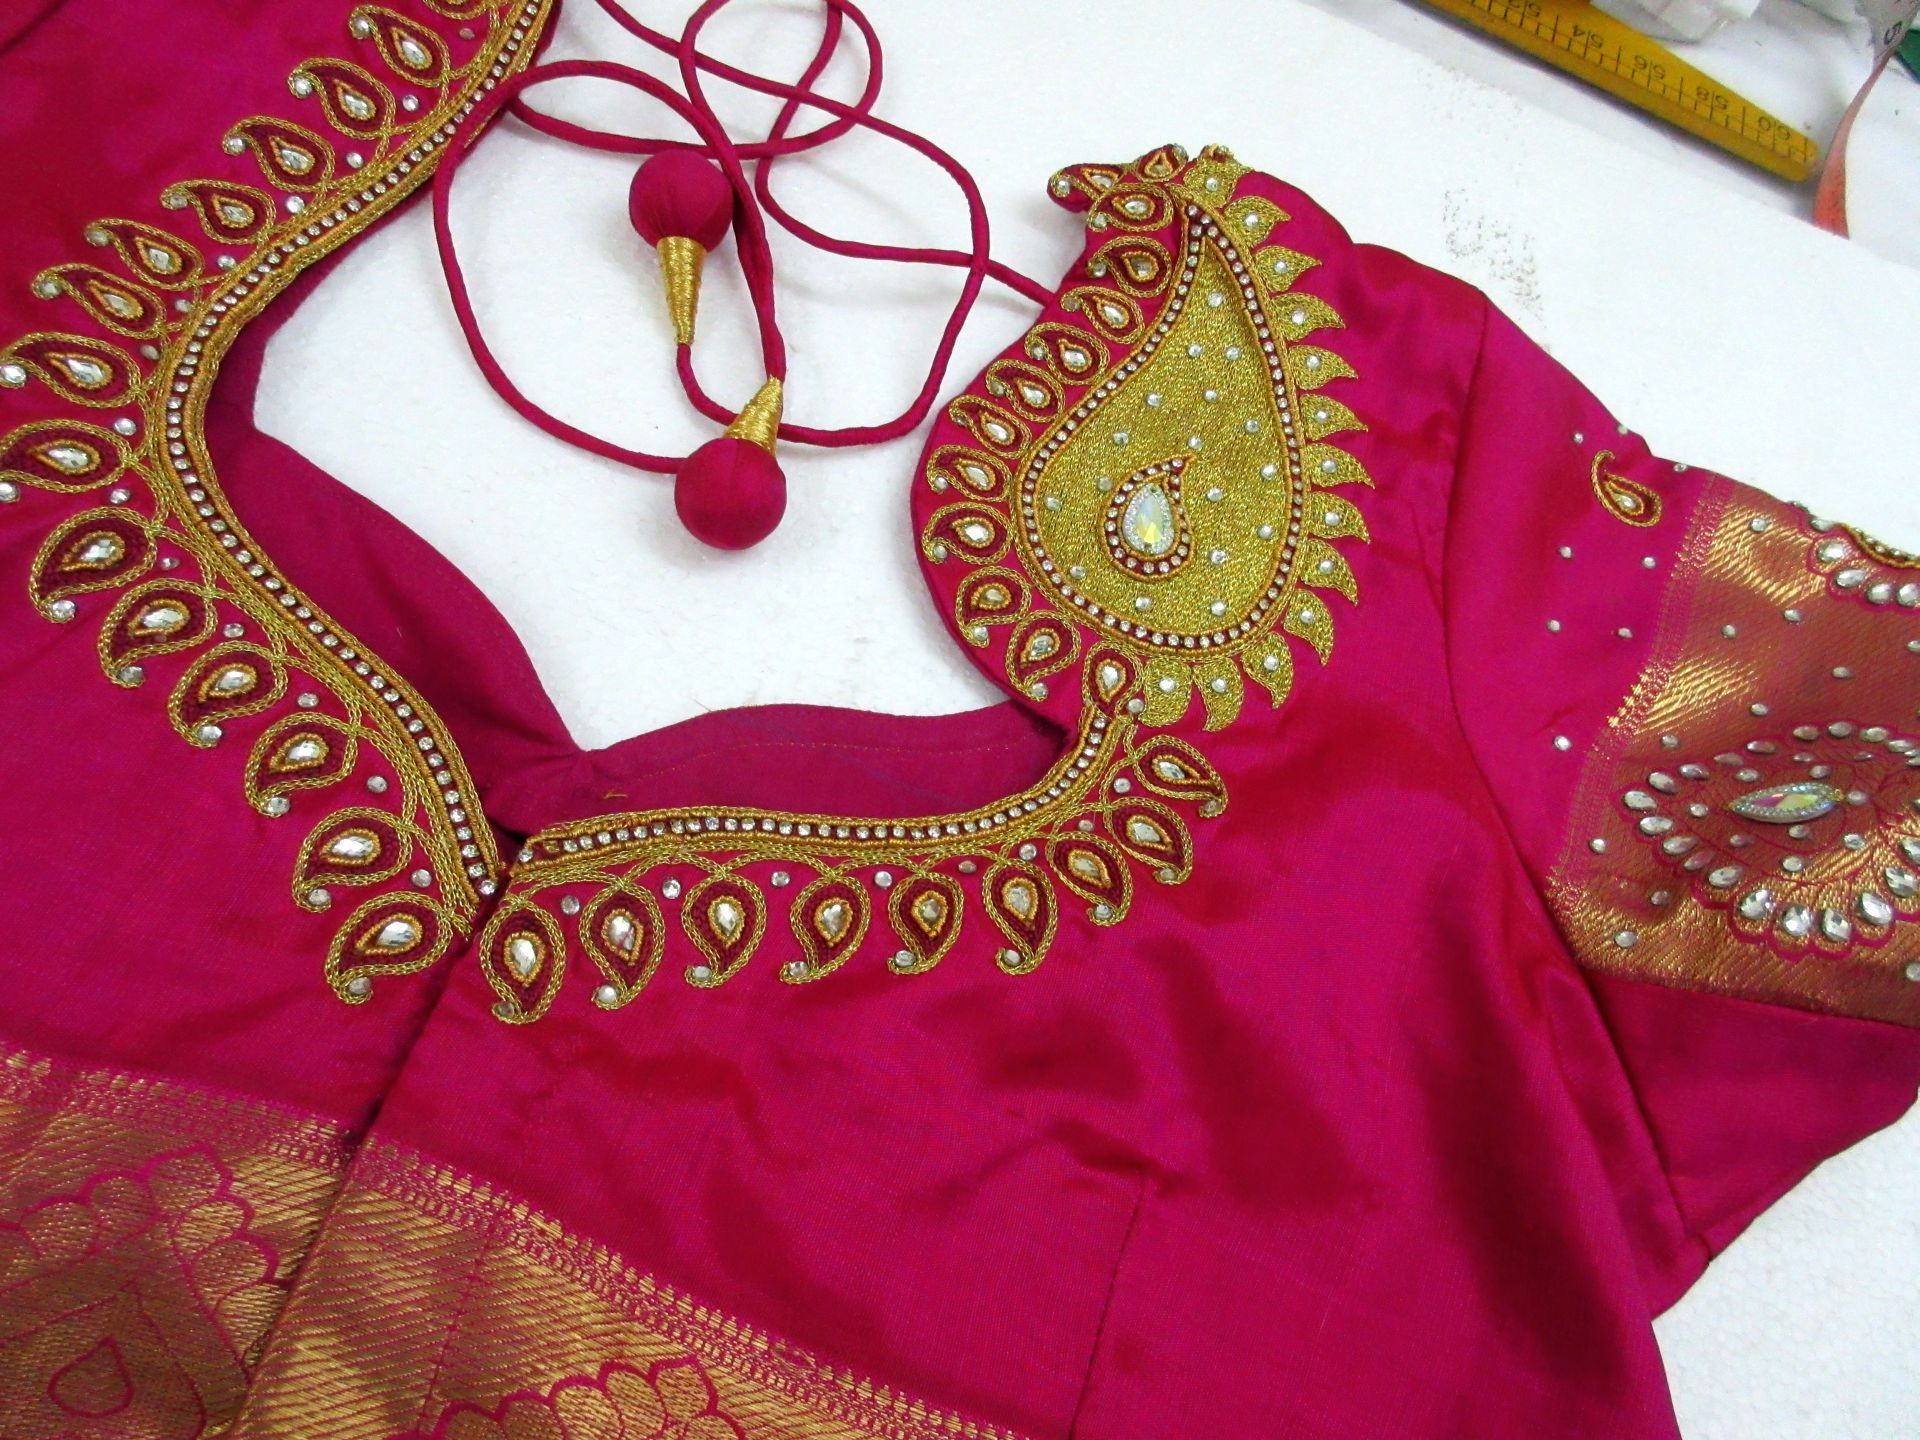 b88283d0f6ff21 Kundan work - hand embroidery